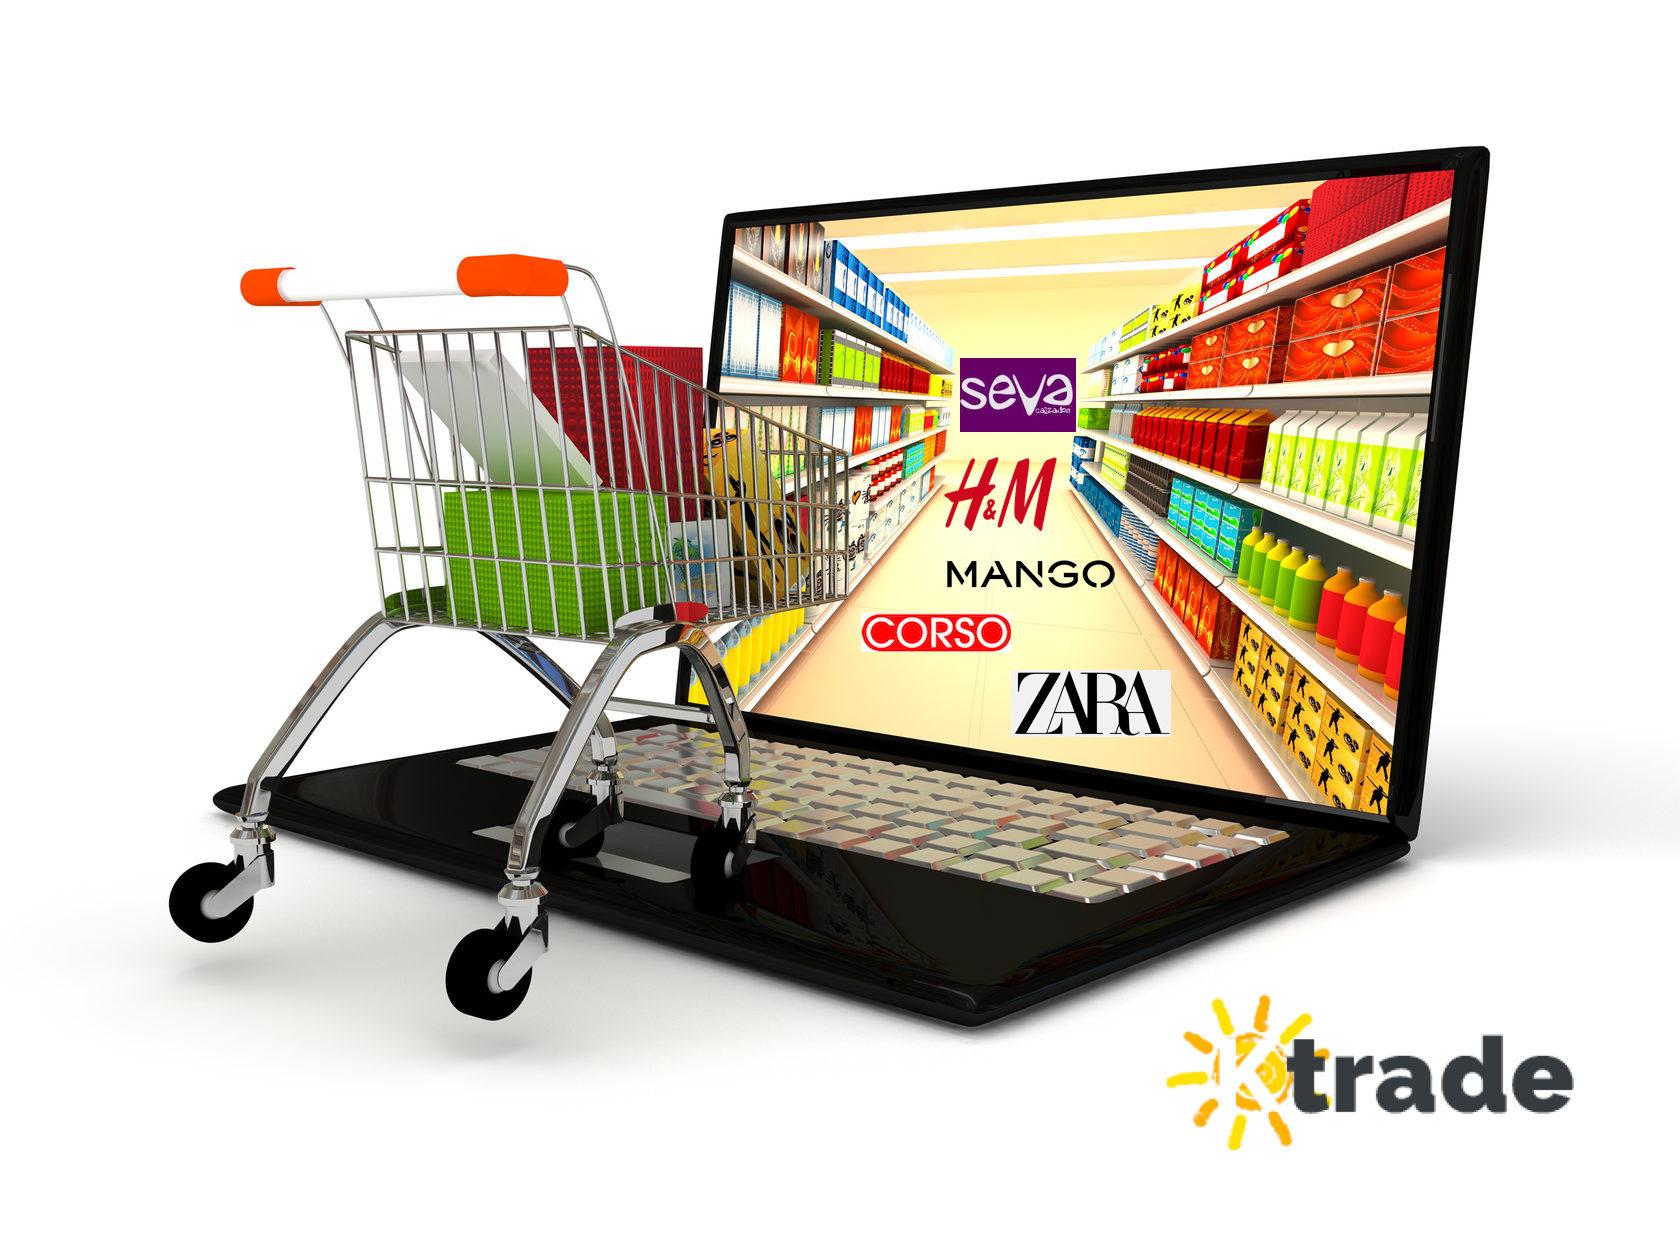 Преимущества шоппинга в интернете.